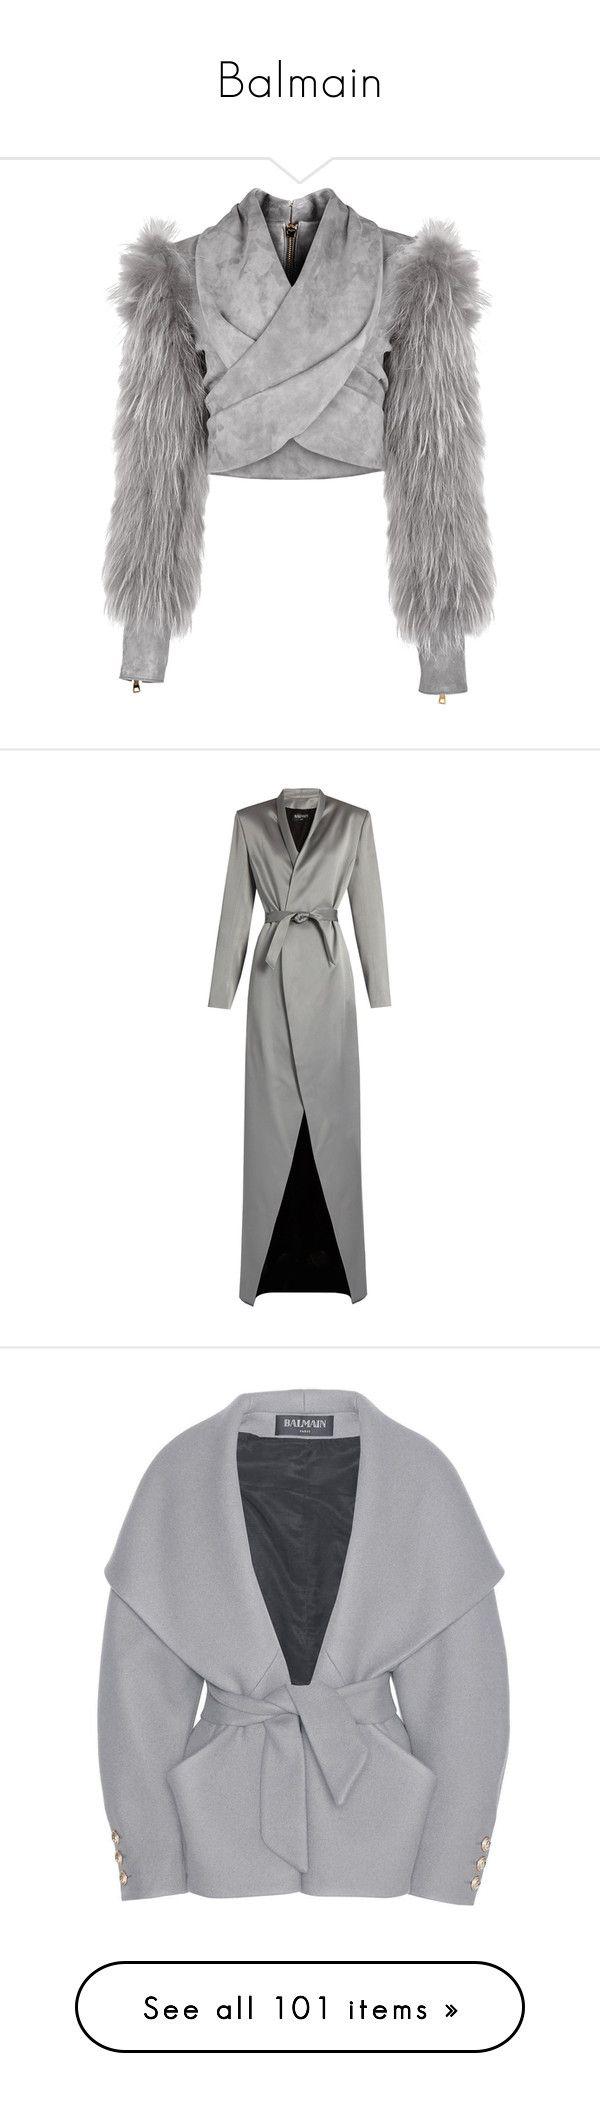 """Balmain"" by mari-sv ❤ liked on Polyvore featuring outerwear, jackets, gray jacket, balmain, balmain jacket, suede fur jacket, cropped jacket, coats, grey and grey coat"